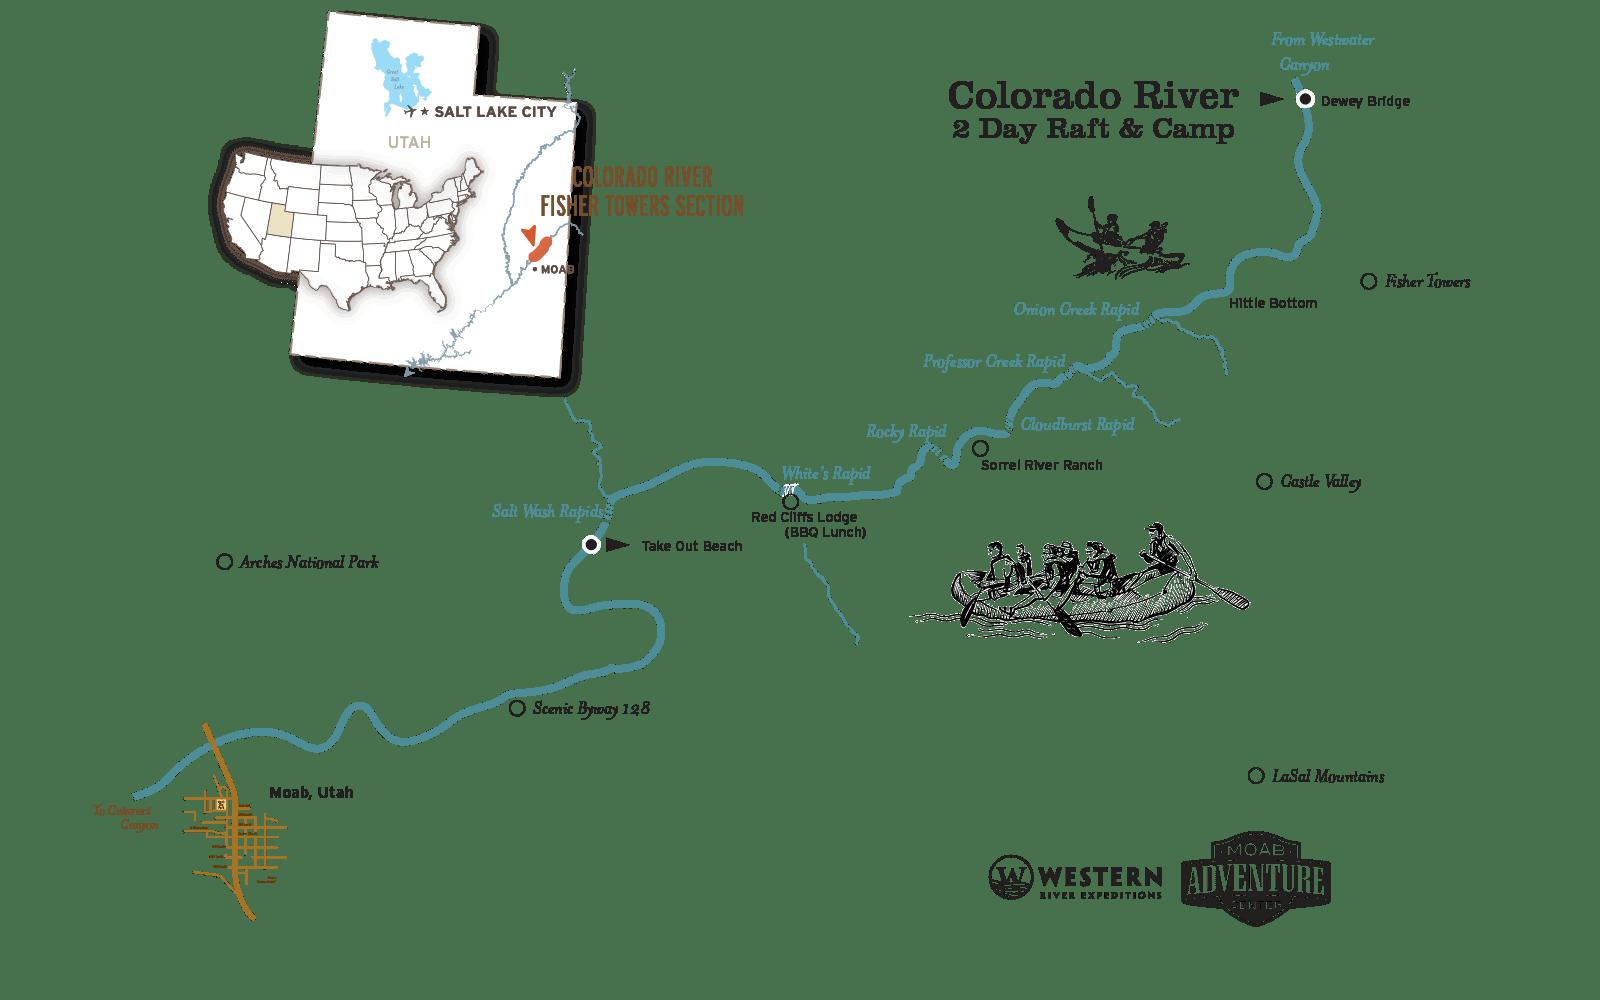 colorado river raft and camp map